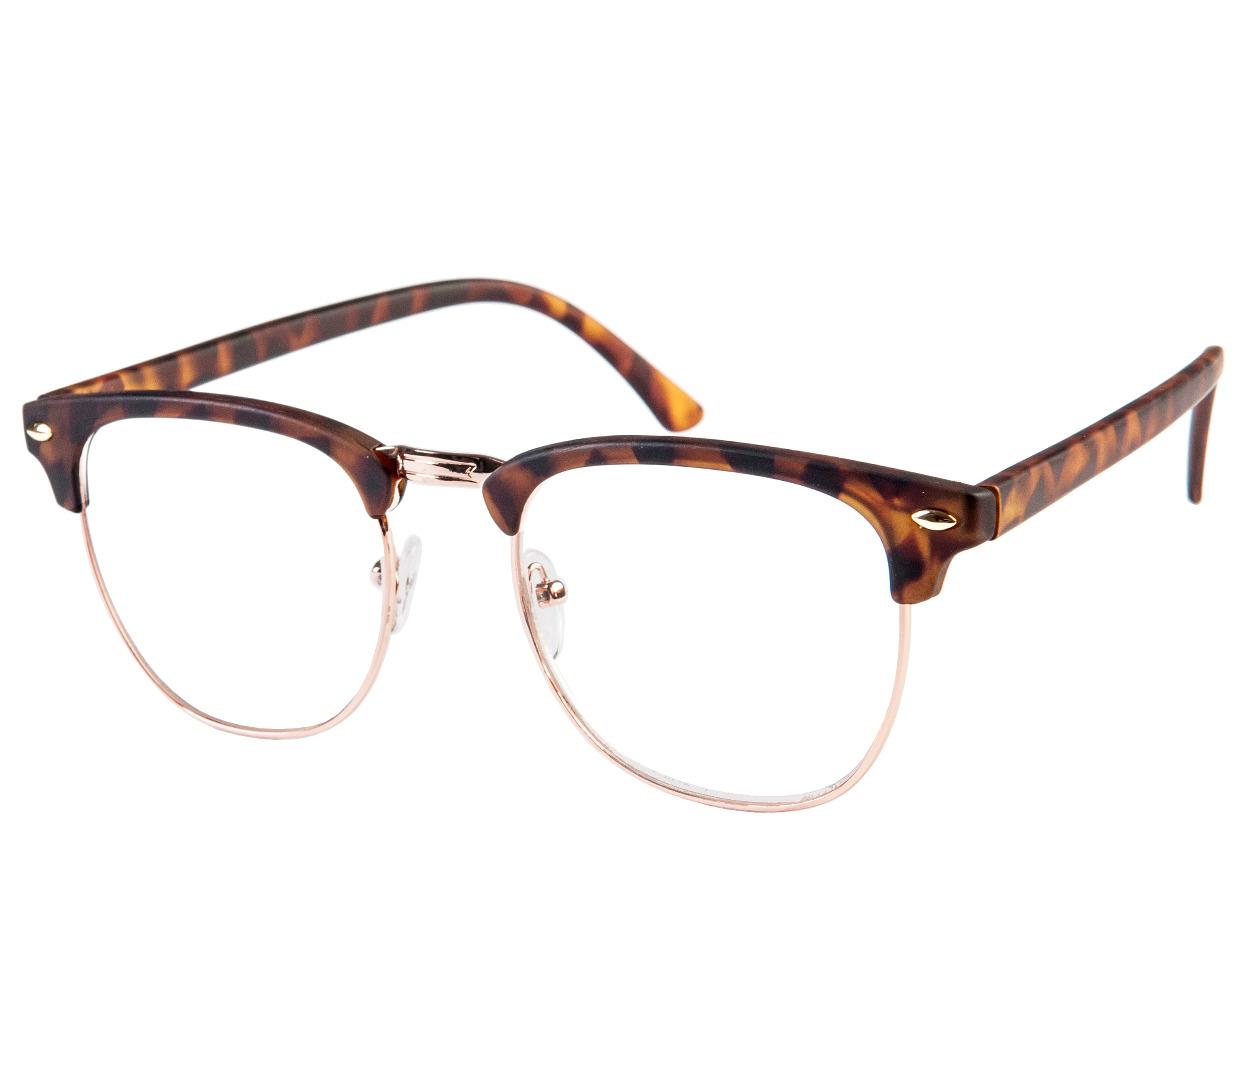 Vintage Eyeglass Frames Seattle : Seattle (Tortoiseshell) Reading Glasses - Tiger Specs